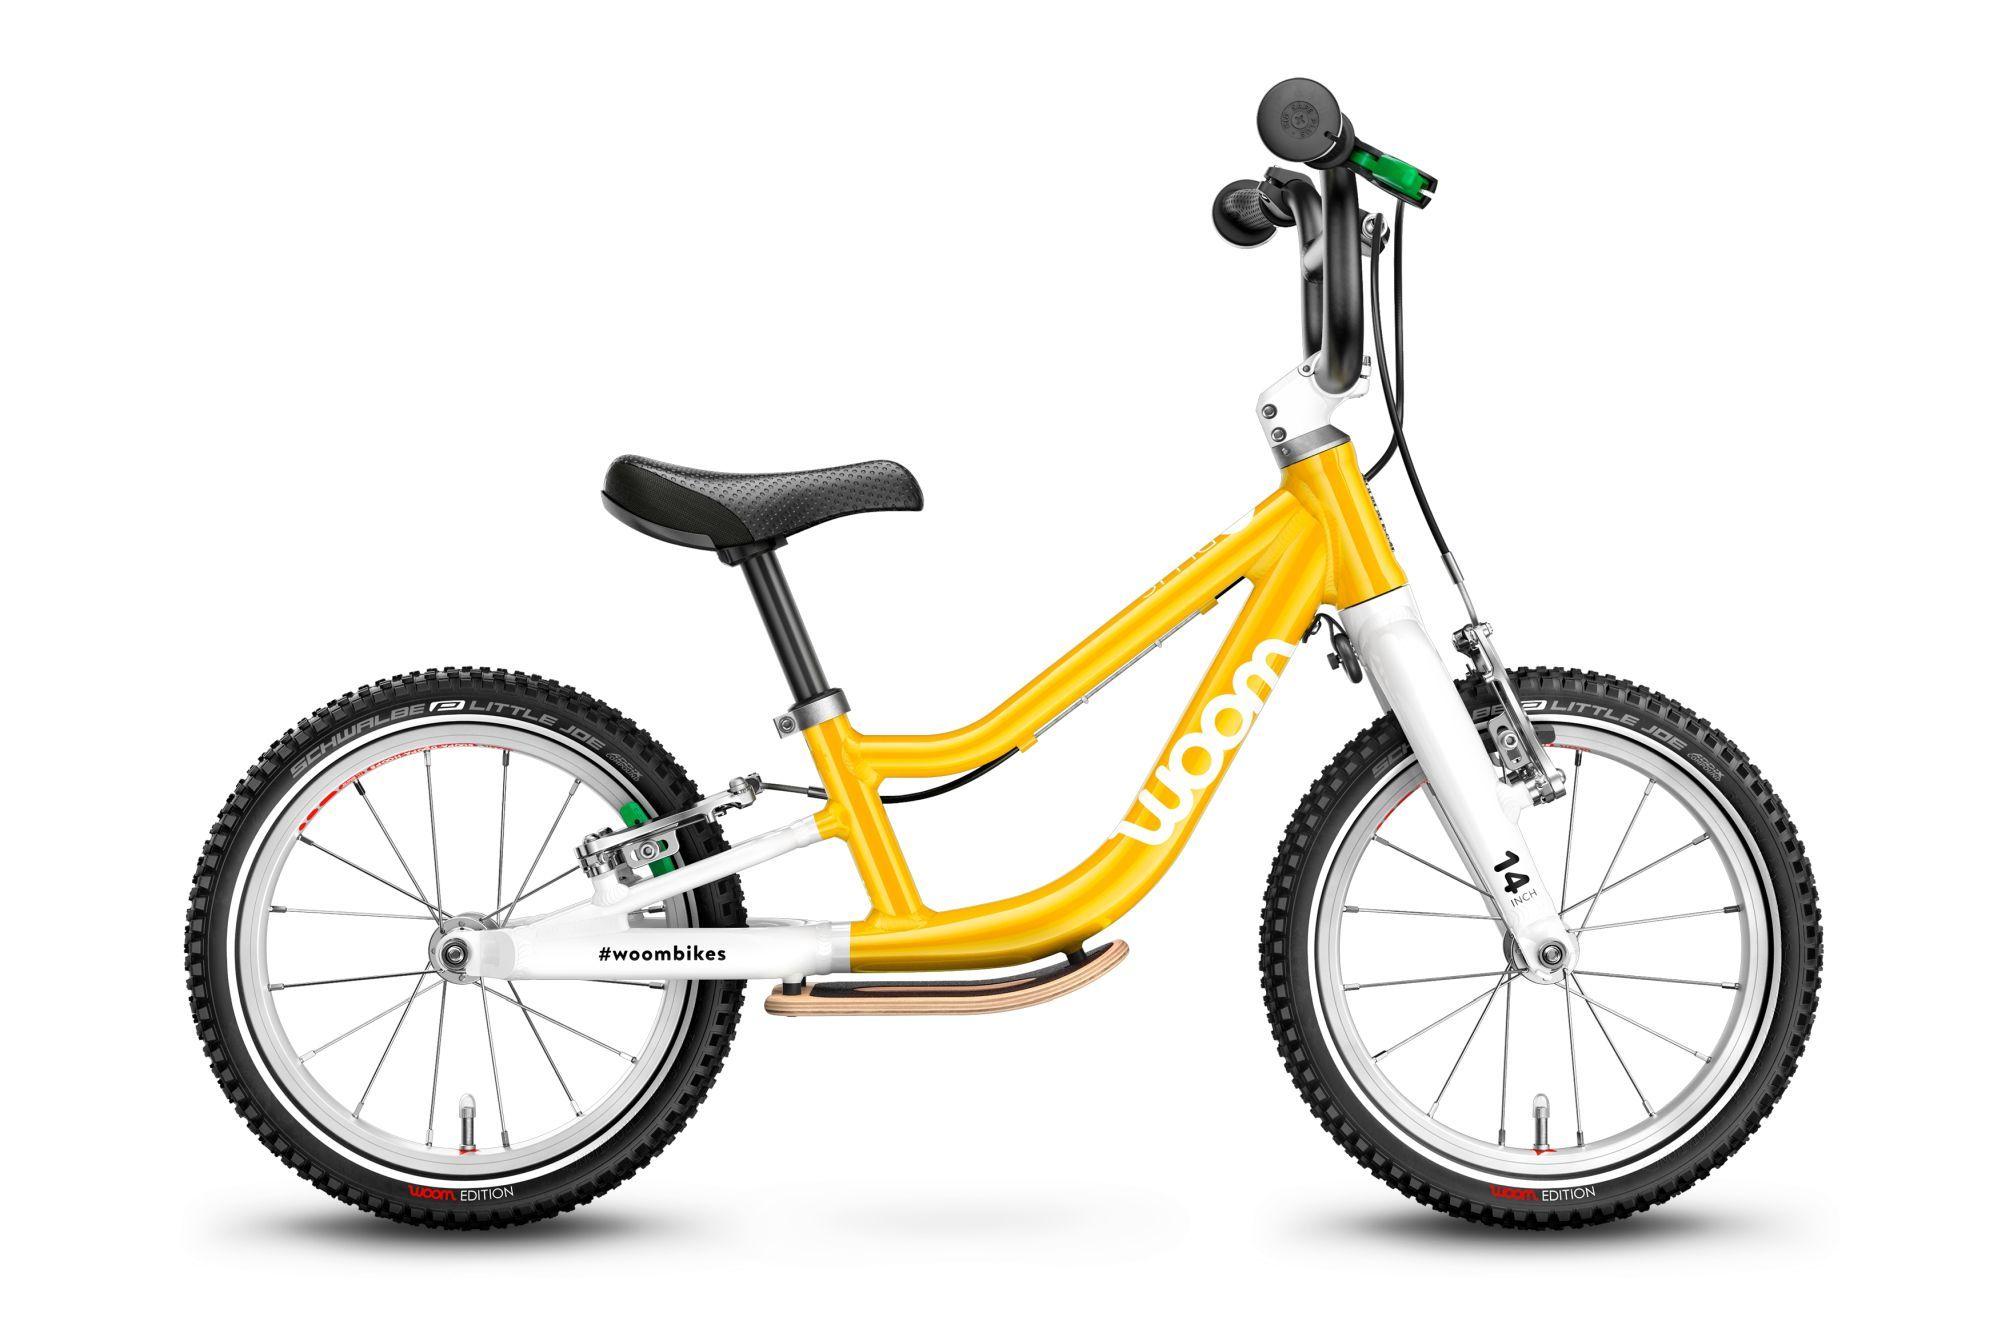 kinderfahrzeuge & laufräder: Diamant  1 PLUS 1 Gang Kinderlaufrad Diamant Modell 2021 14 Zoll